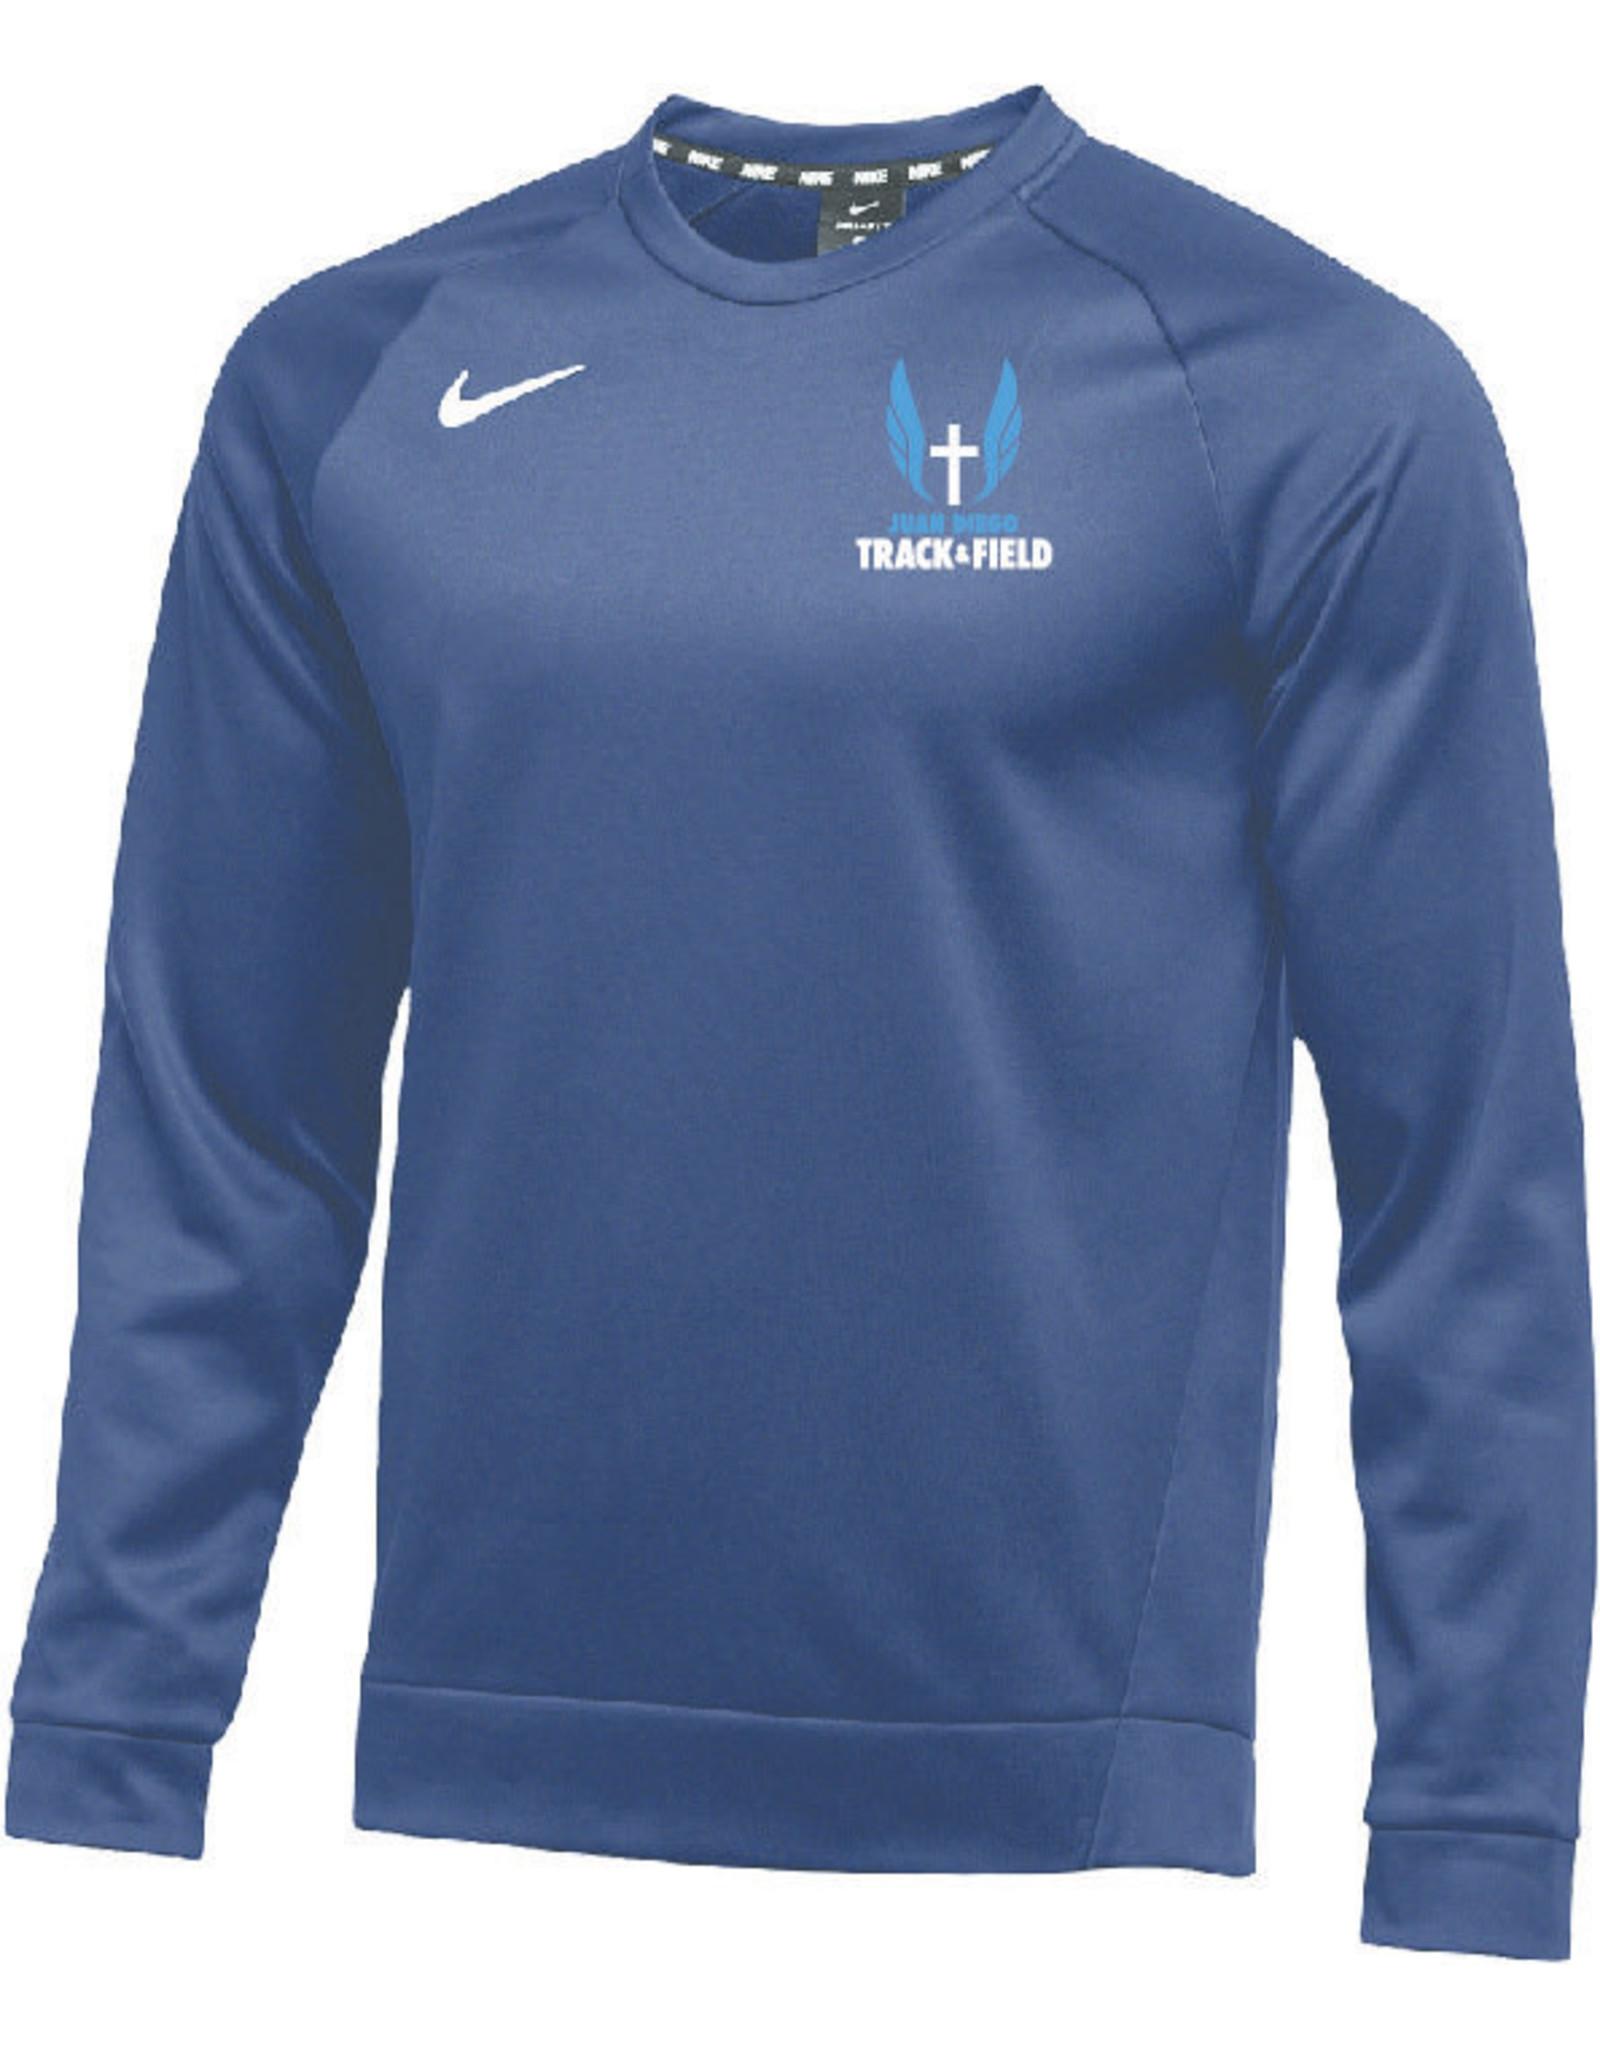 NON-UNIFORM JD Track & Field Custom Nike Team Therma Crew